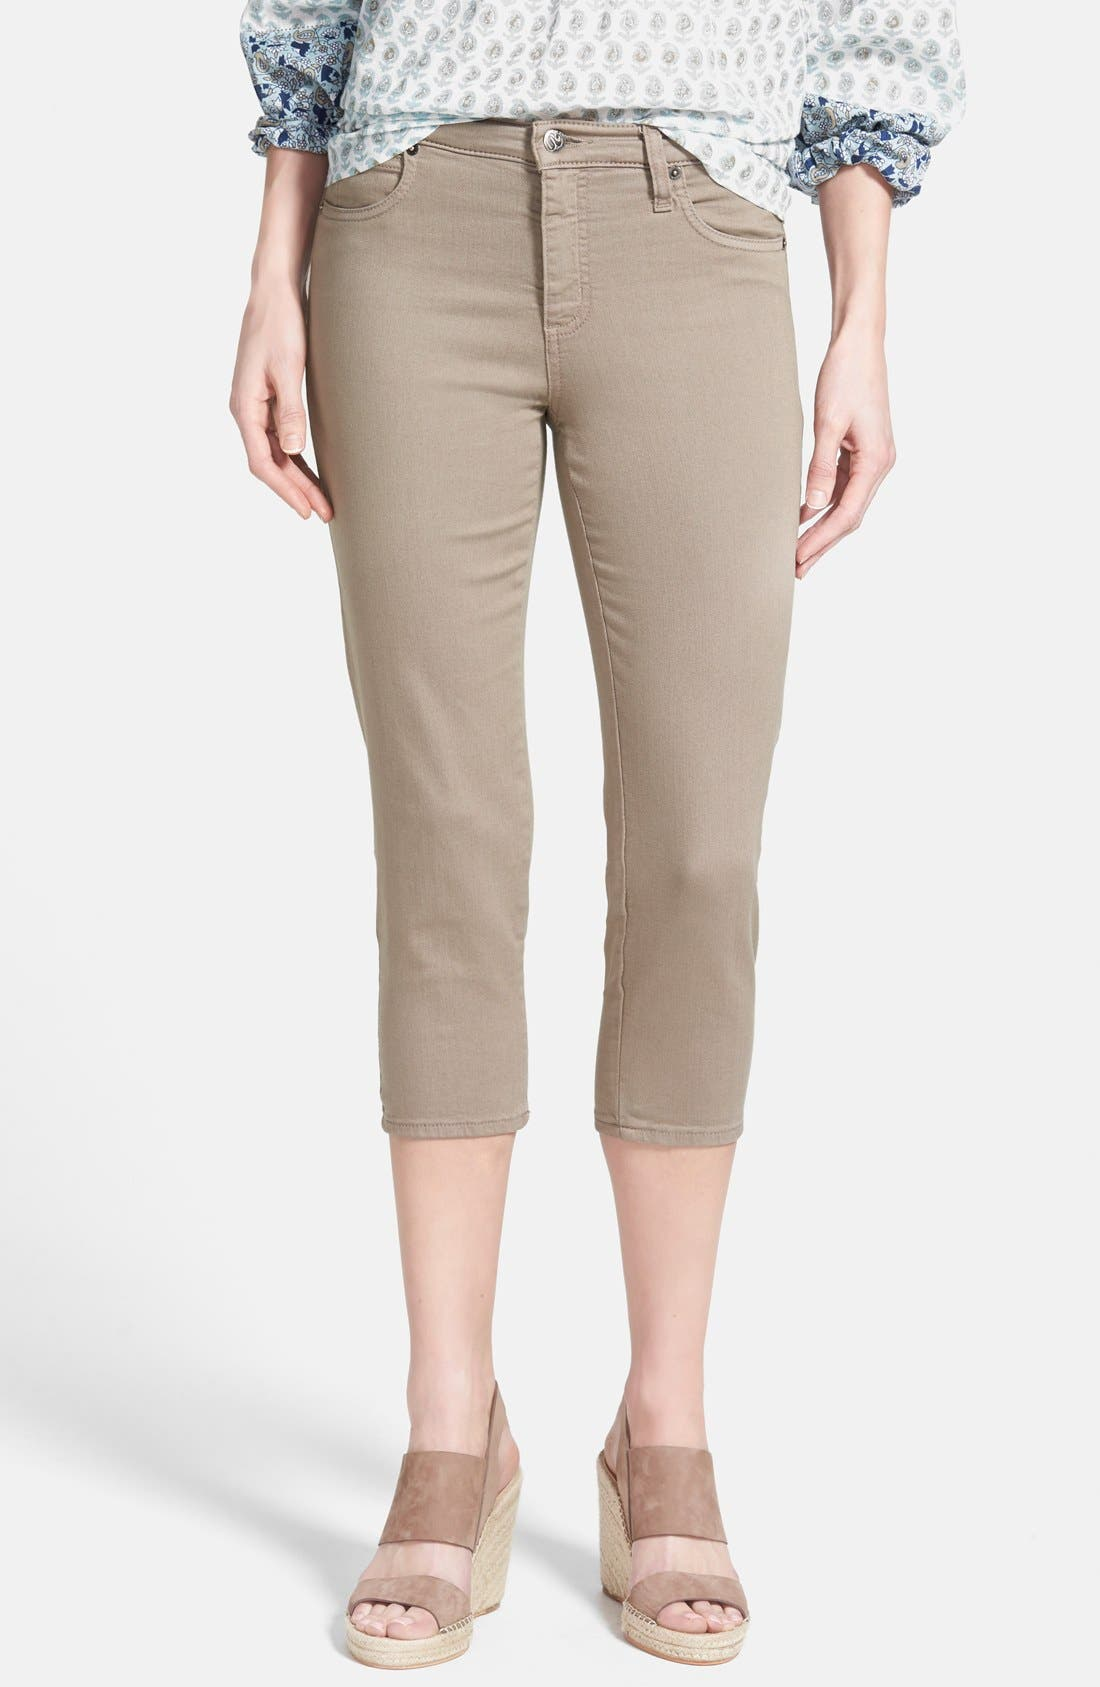 Alternate Image 1 Selected - Second Yoga Jeans Capri Jeans